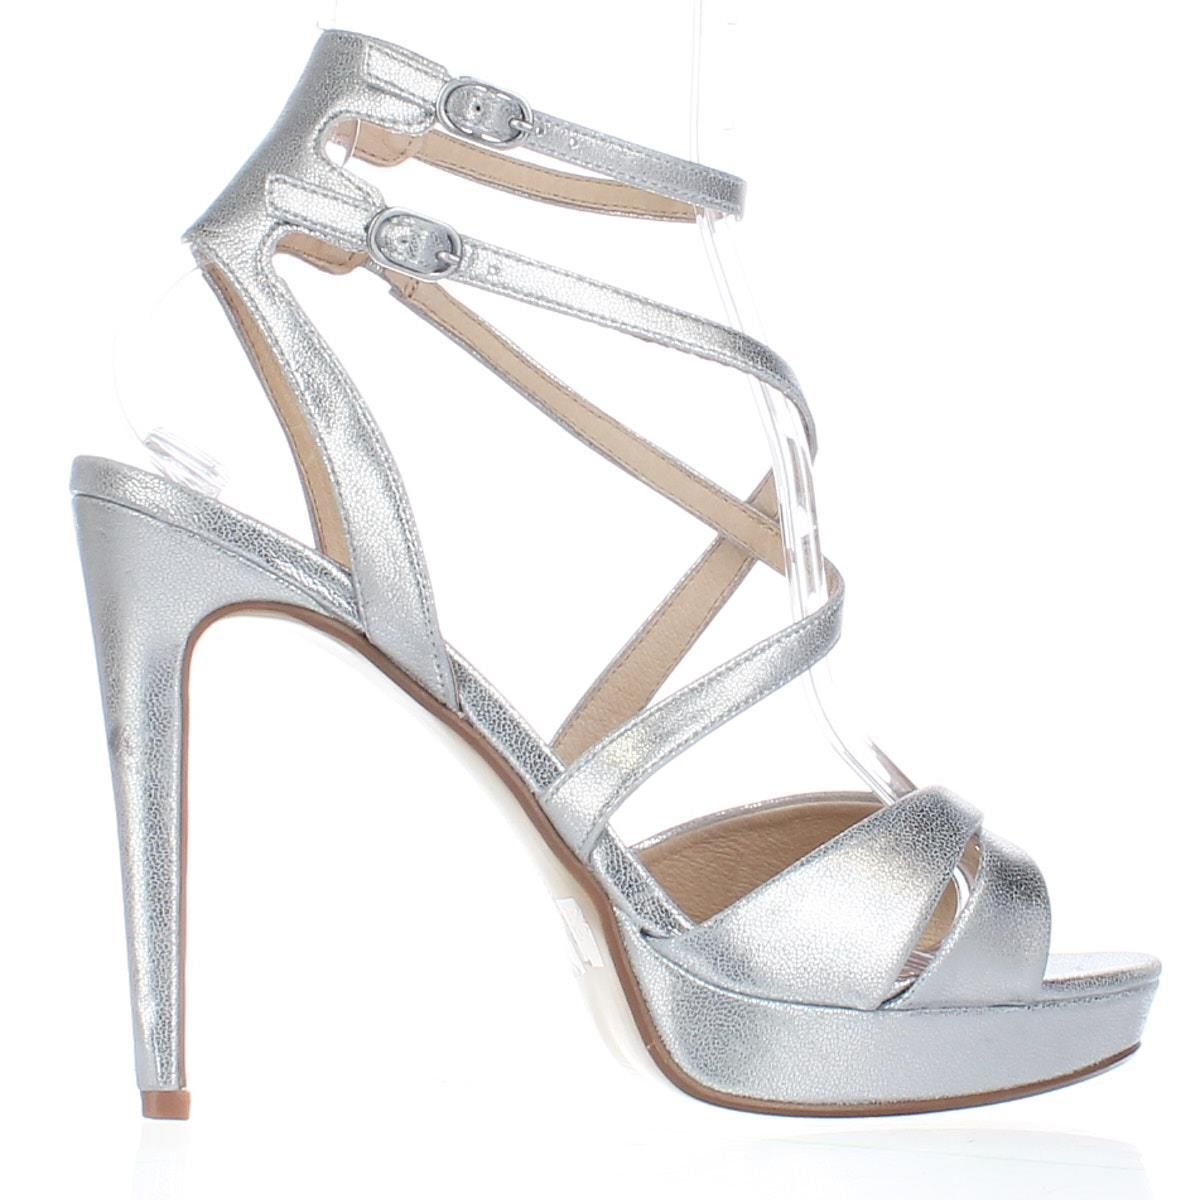 Chinese Laundry Highlight Platform Dress Sandals Silver 10US 41EU  sandals   heels  strappy 17553ef6937c